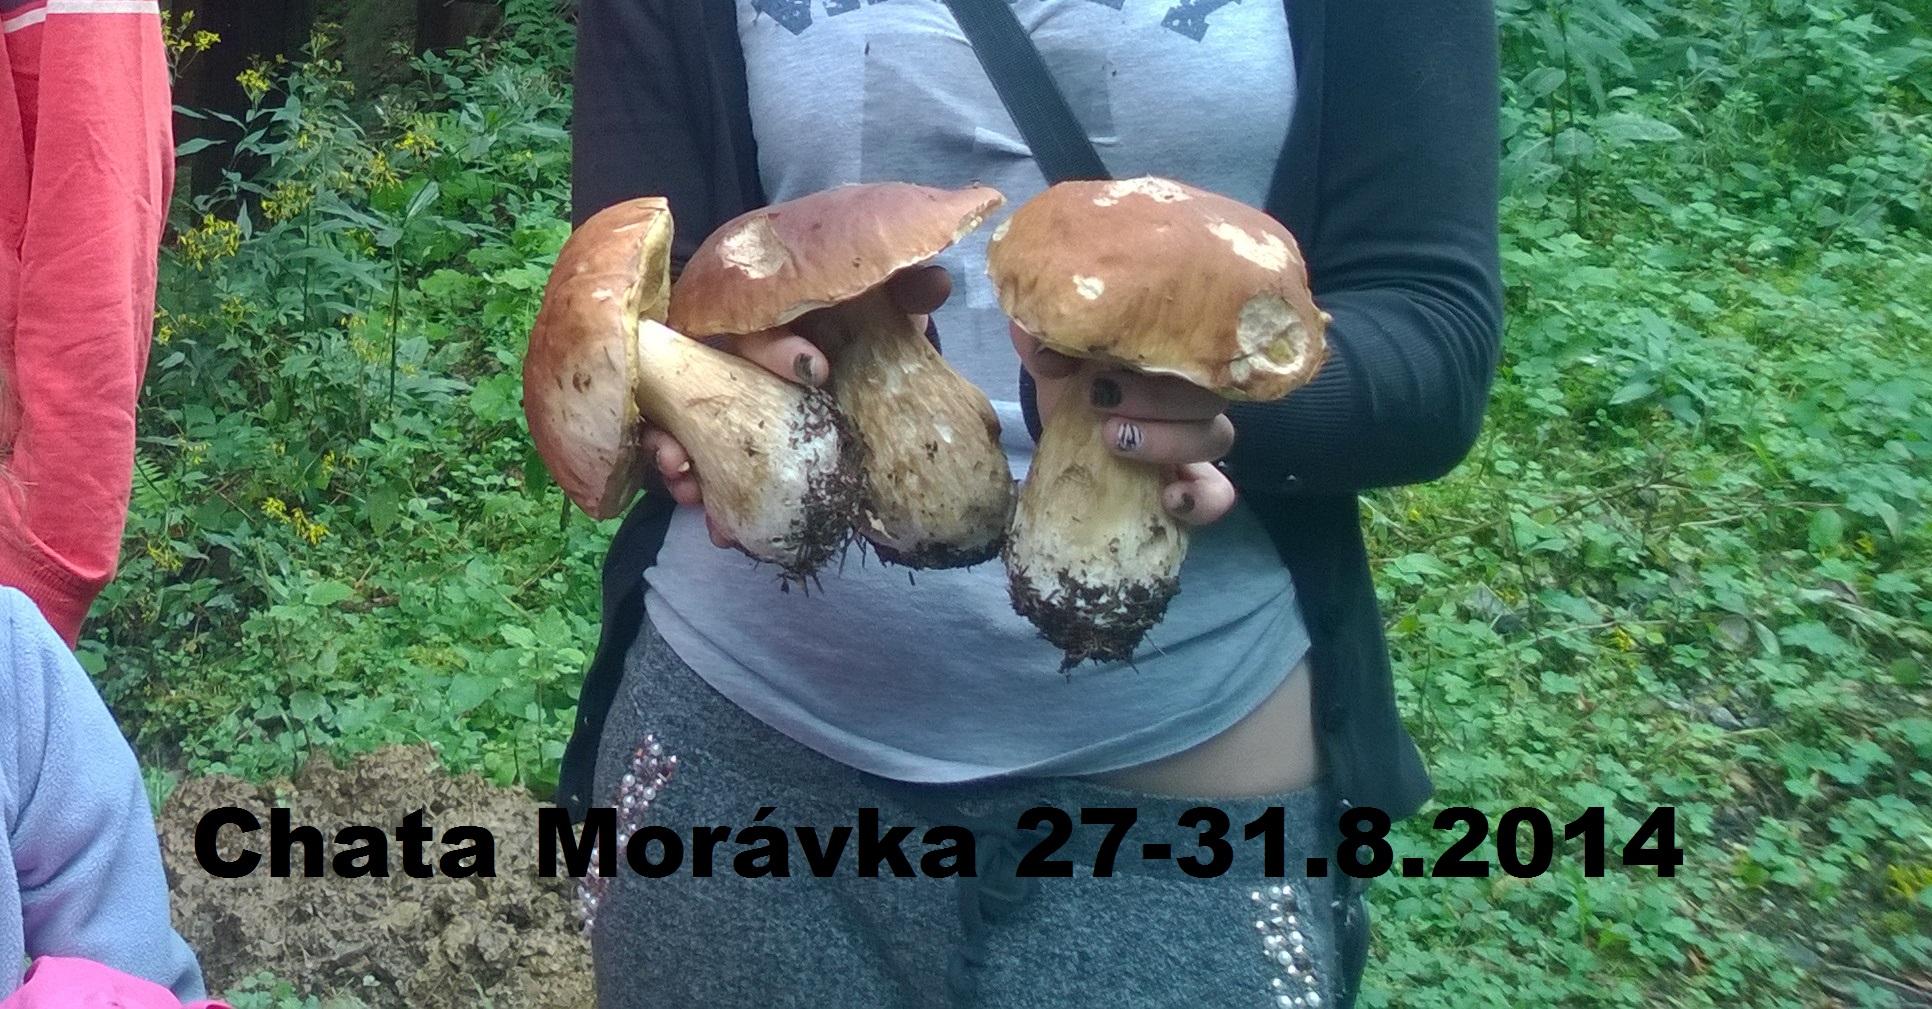 MORAVKA 27-31.8.2014-2